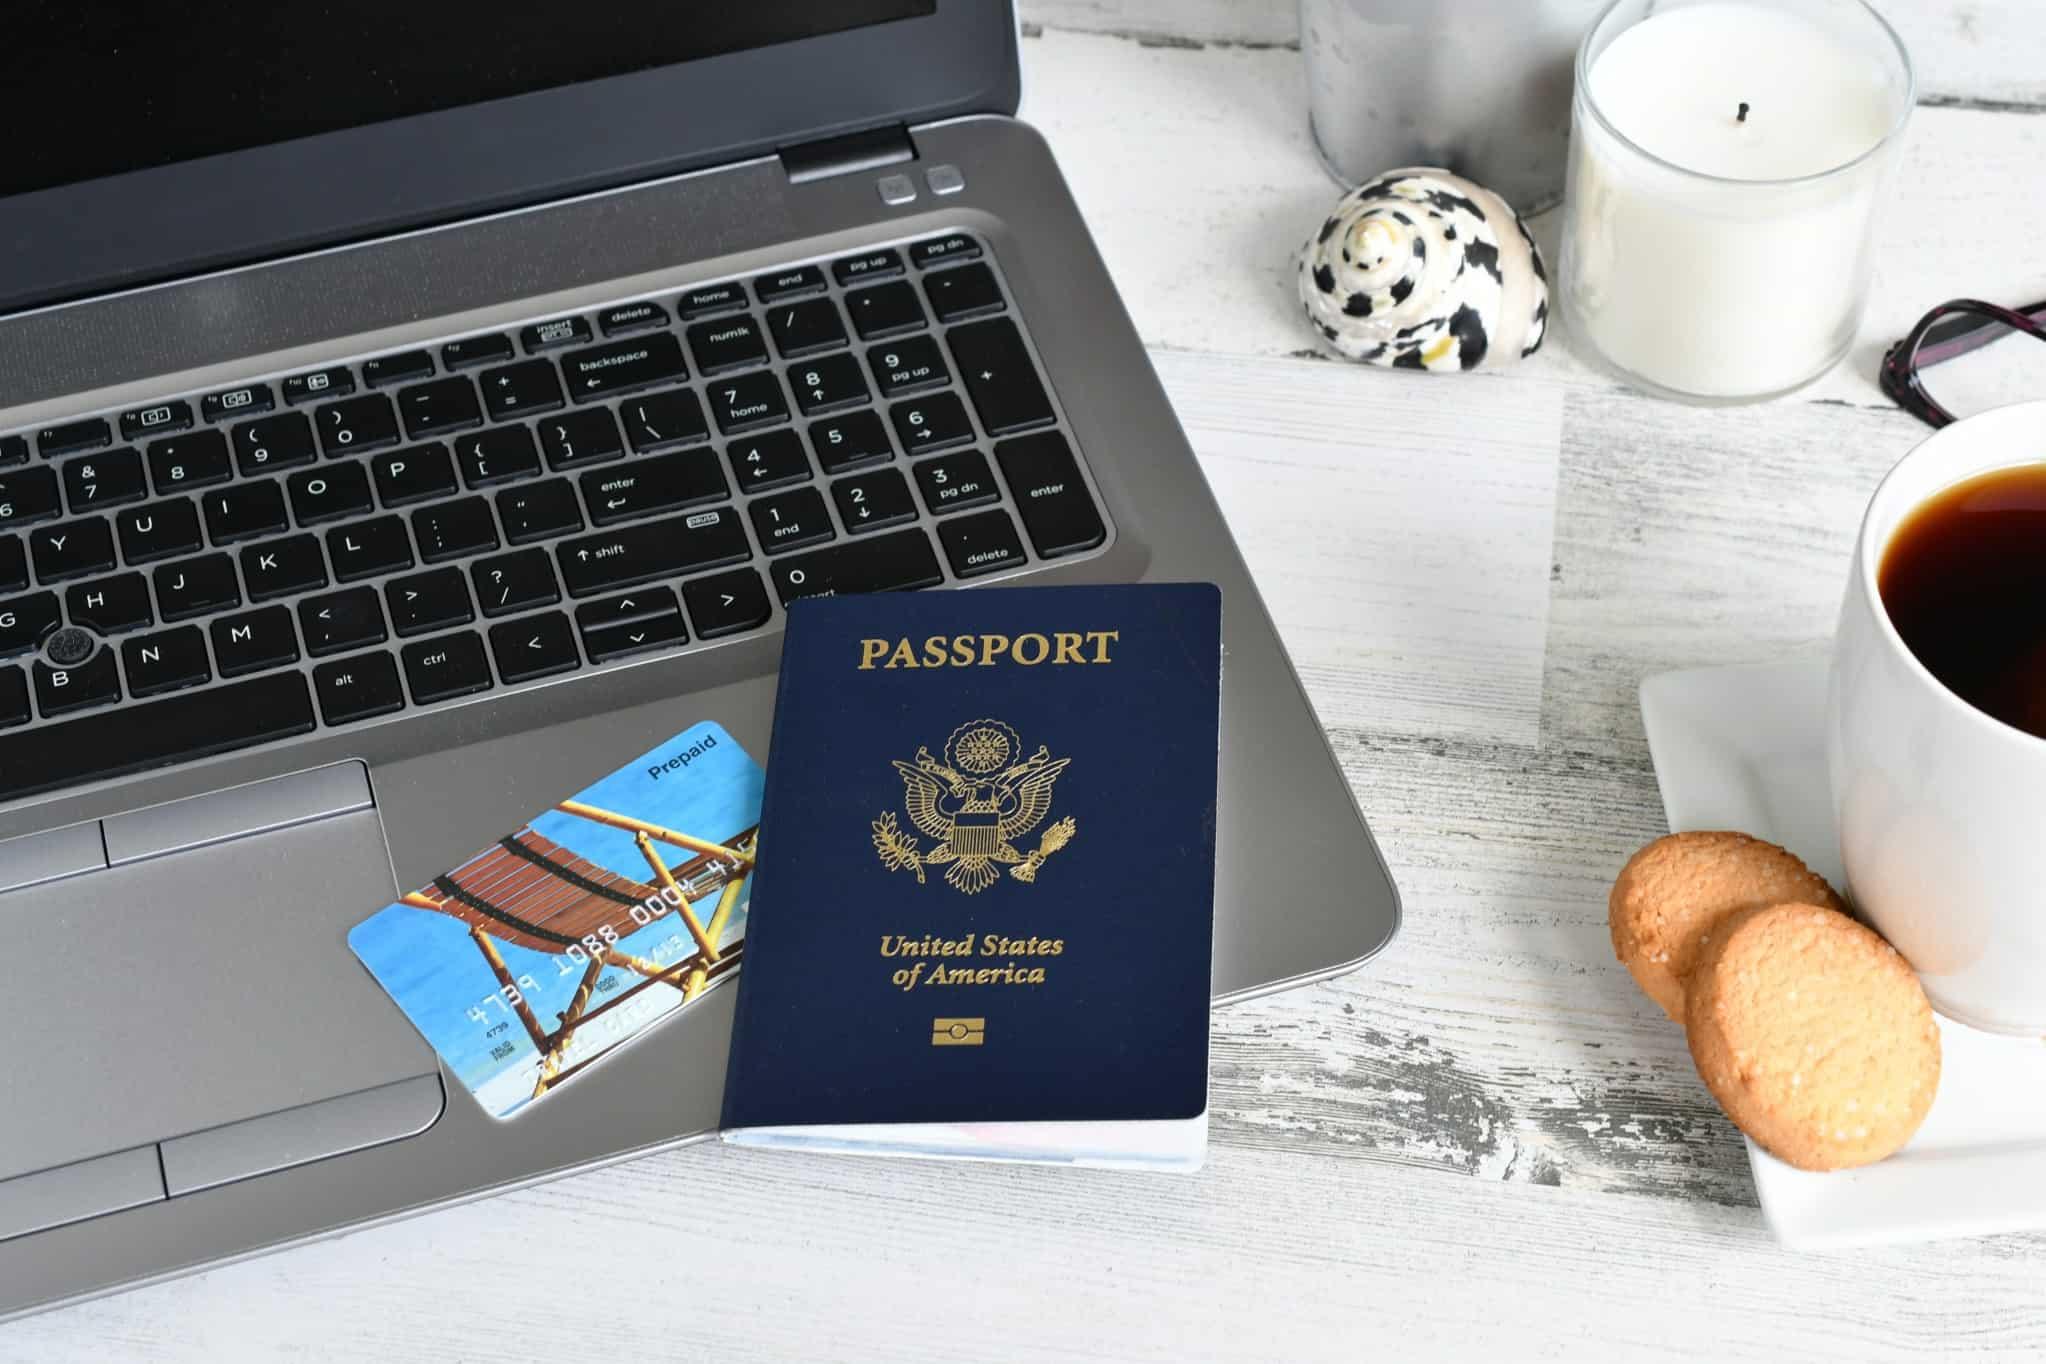 passport-computer-one-way-ticket